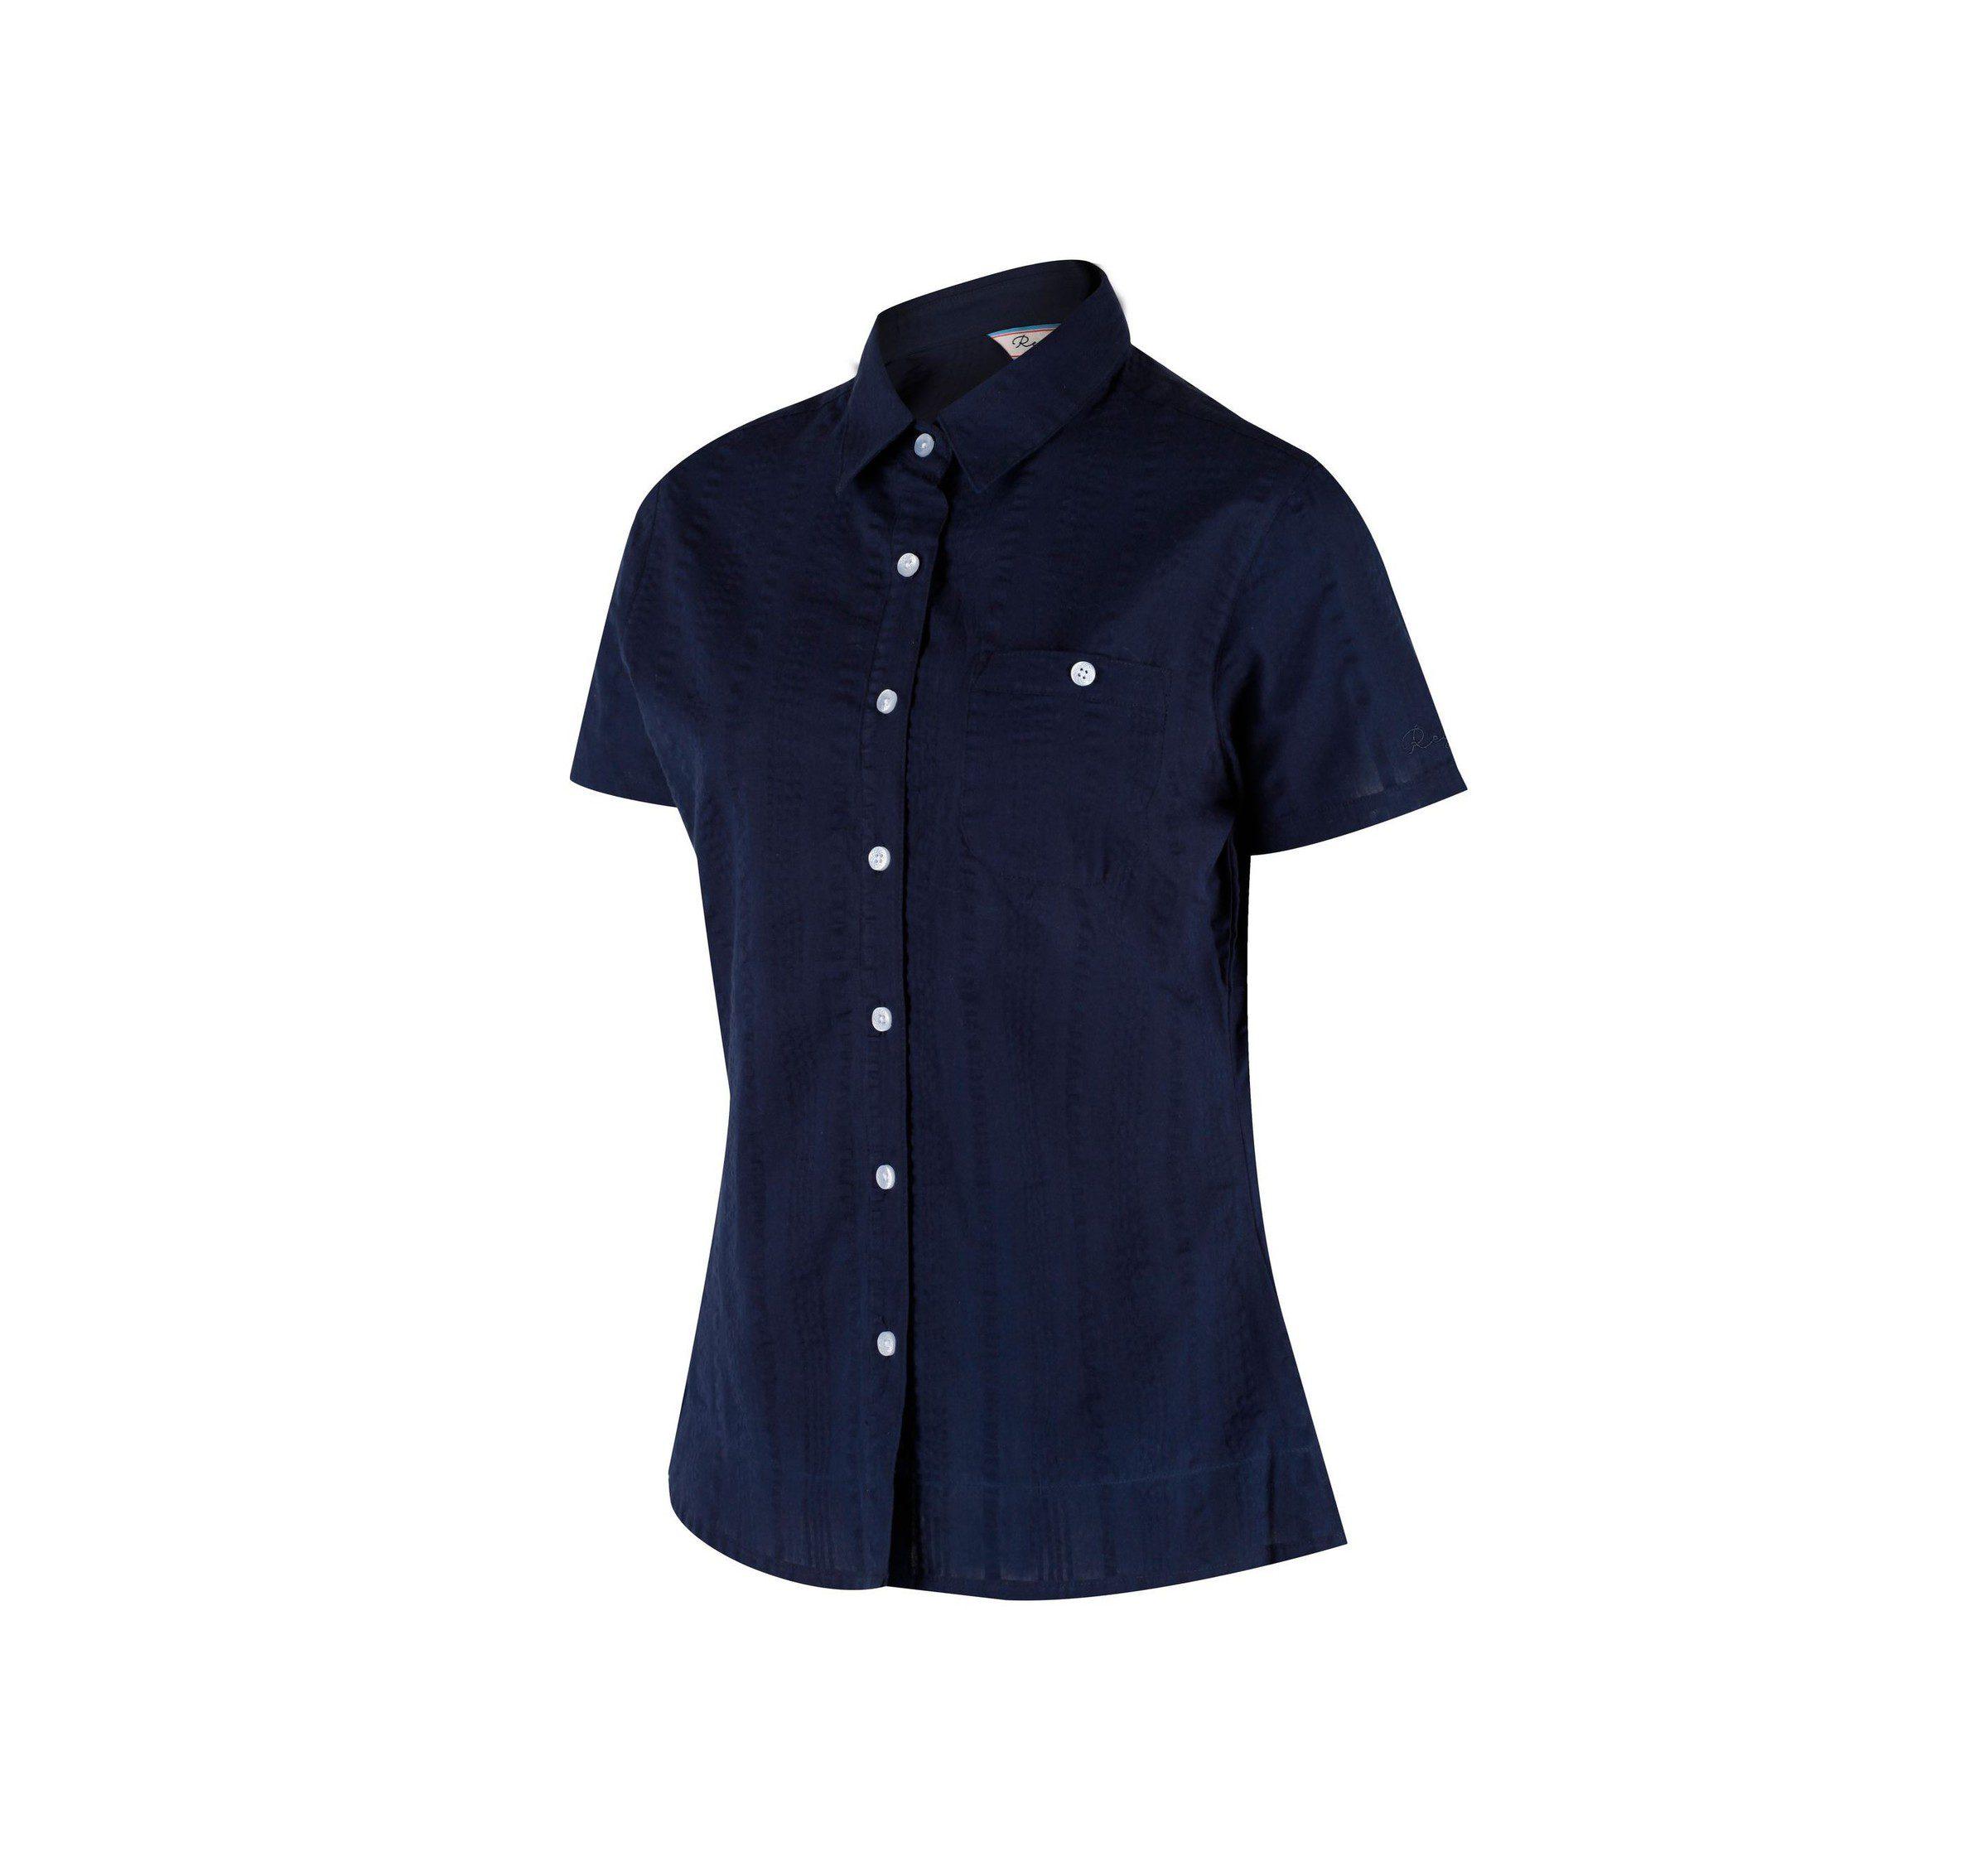 Regatta Women's Jebra Shirt - Navy